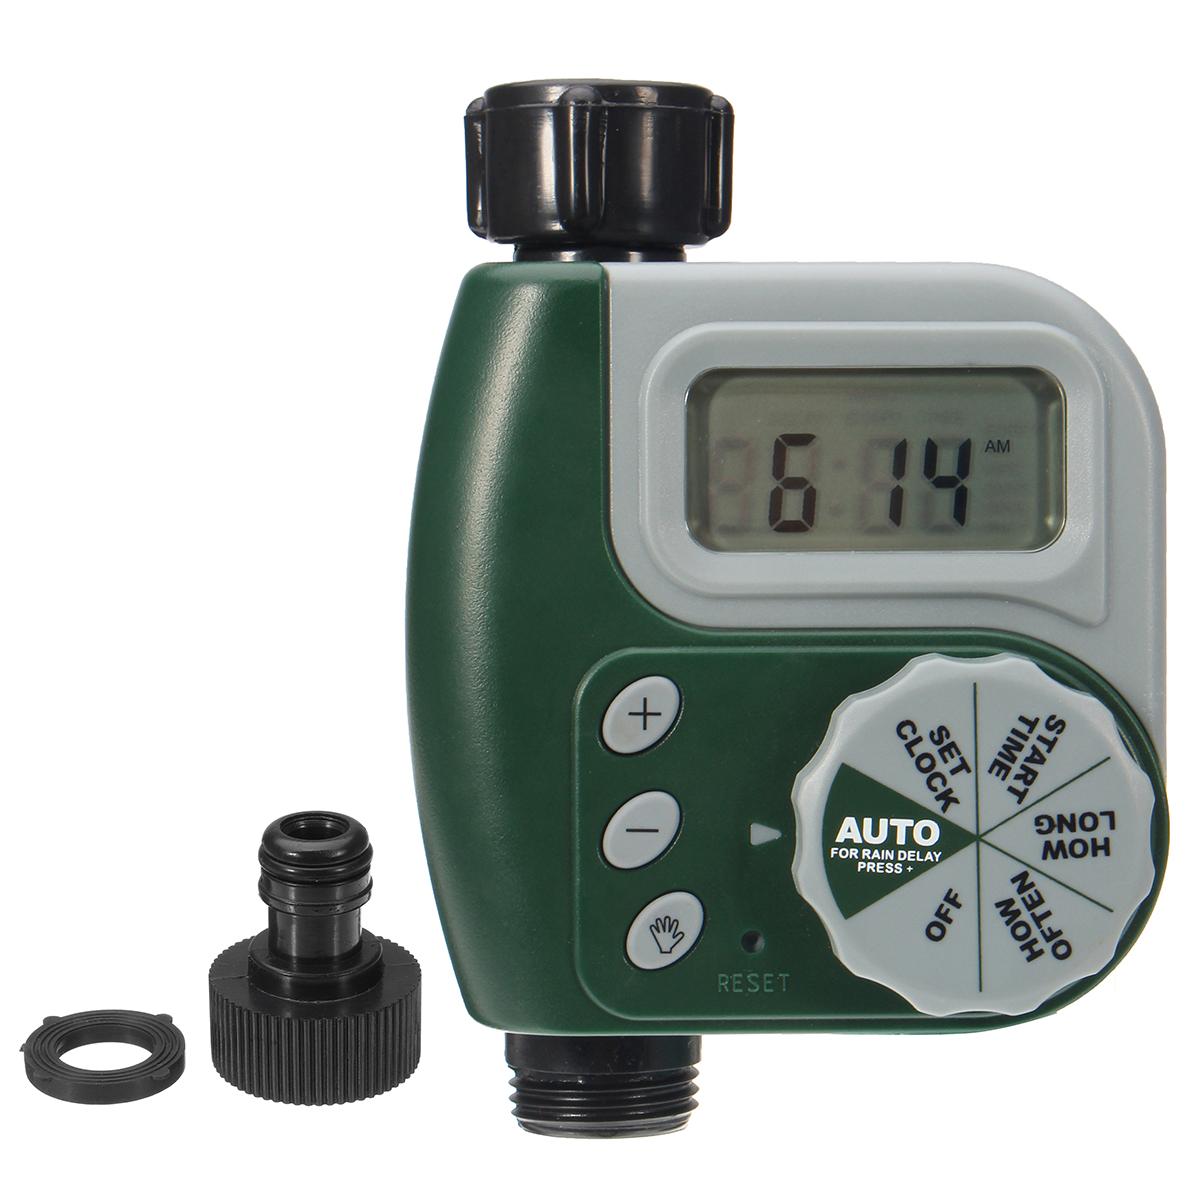 Orbit Electronic Water Tap Timer Garden Irrigation Control Unit Digital LCD